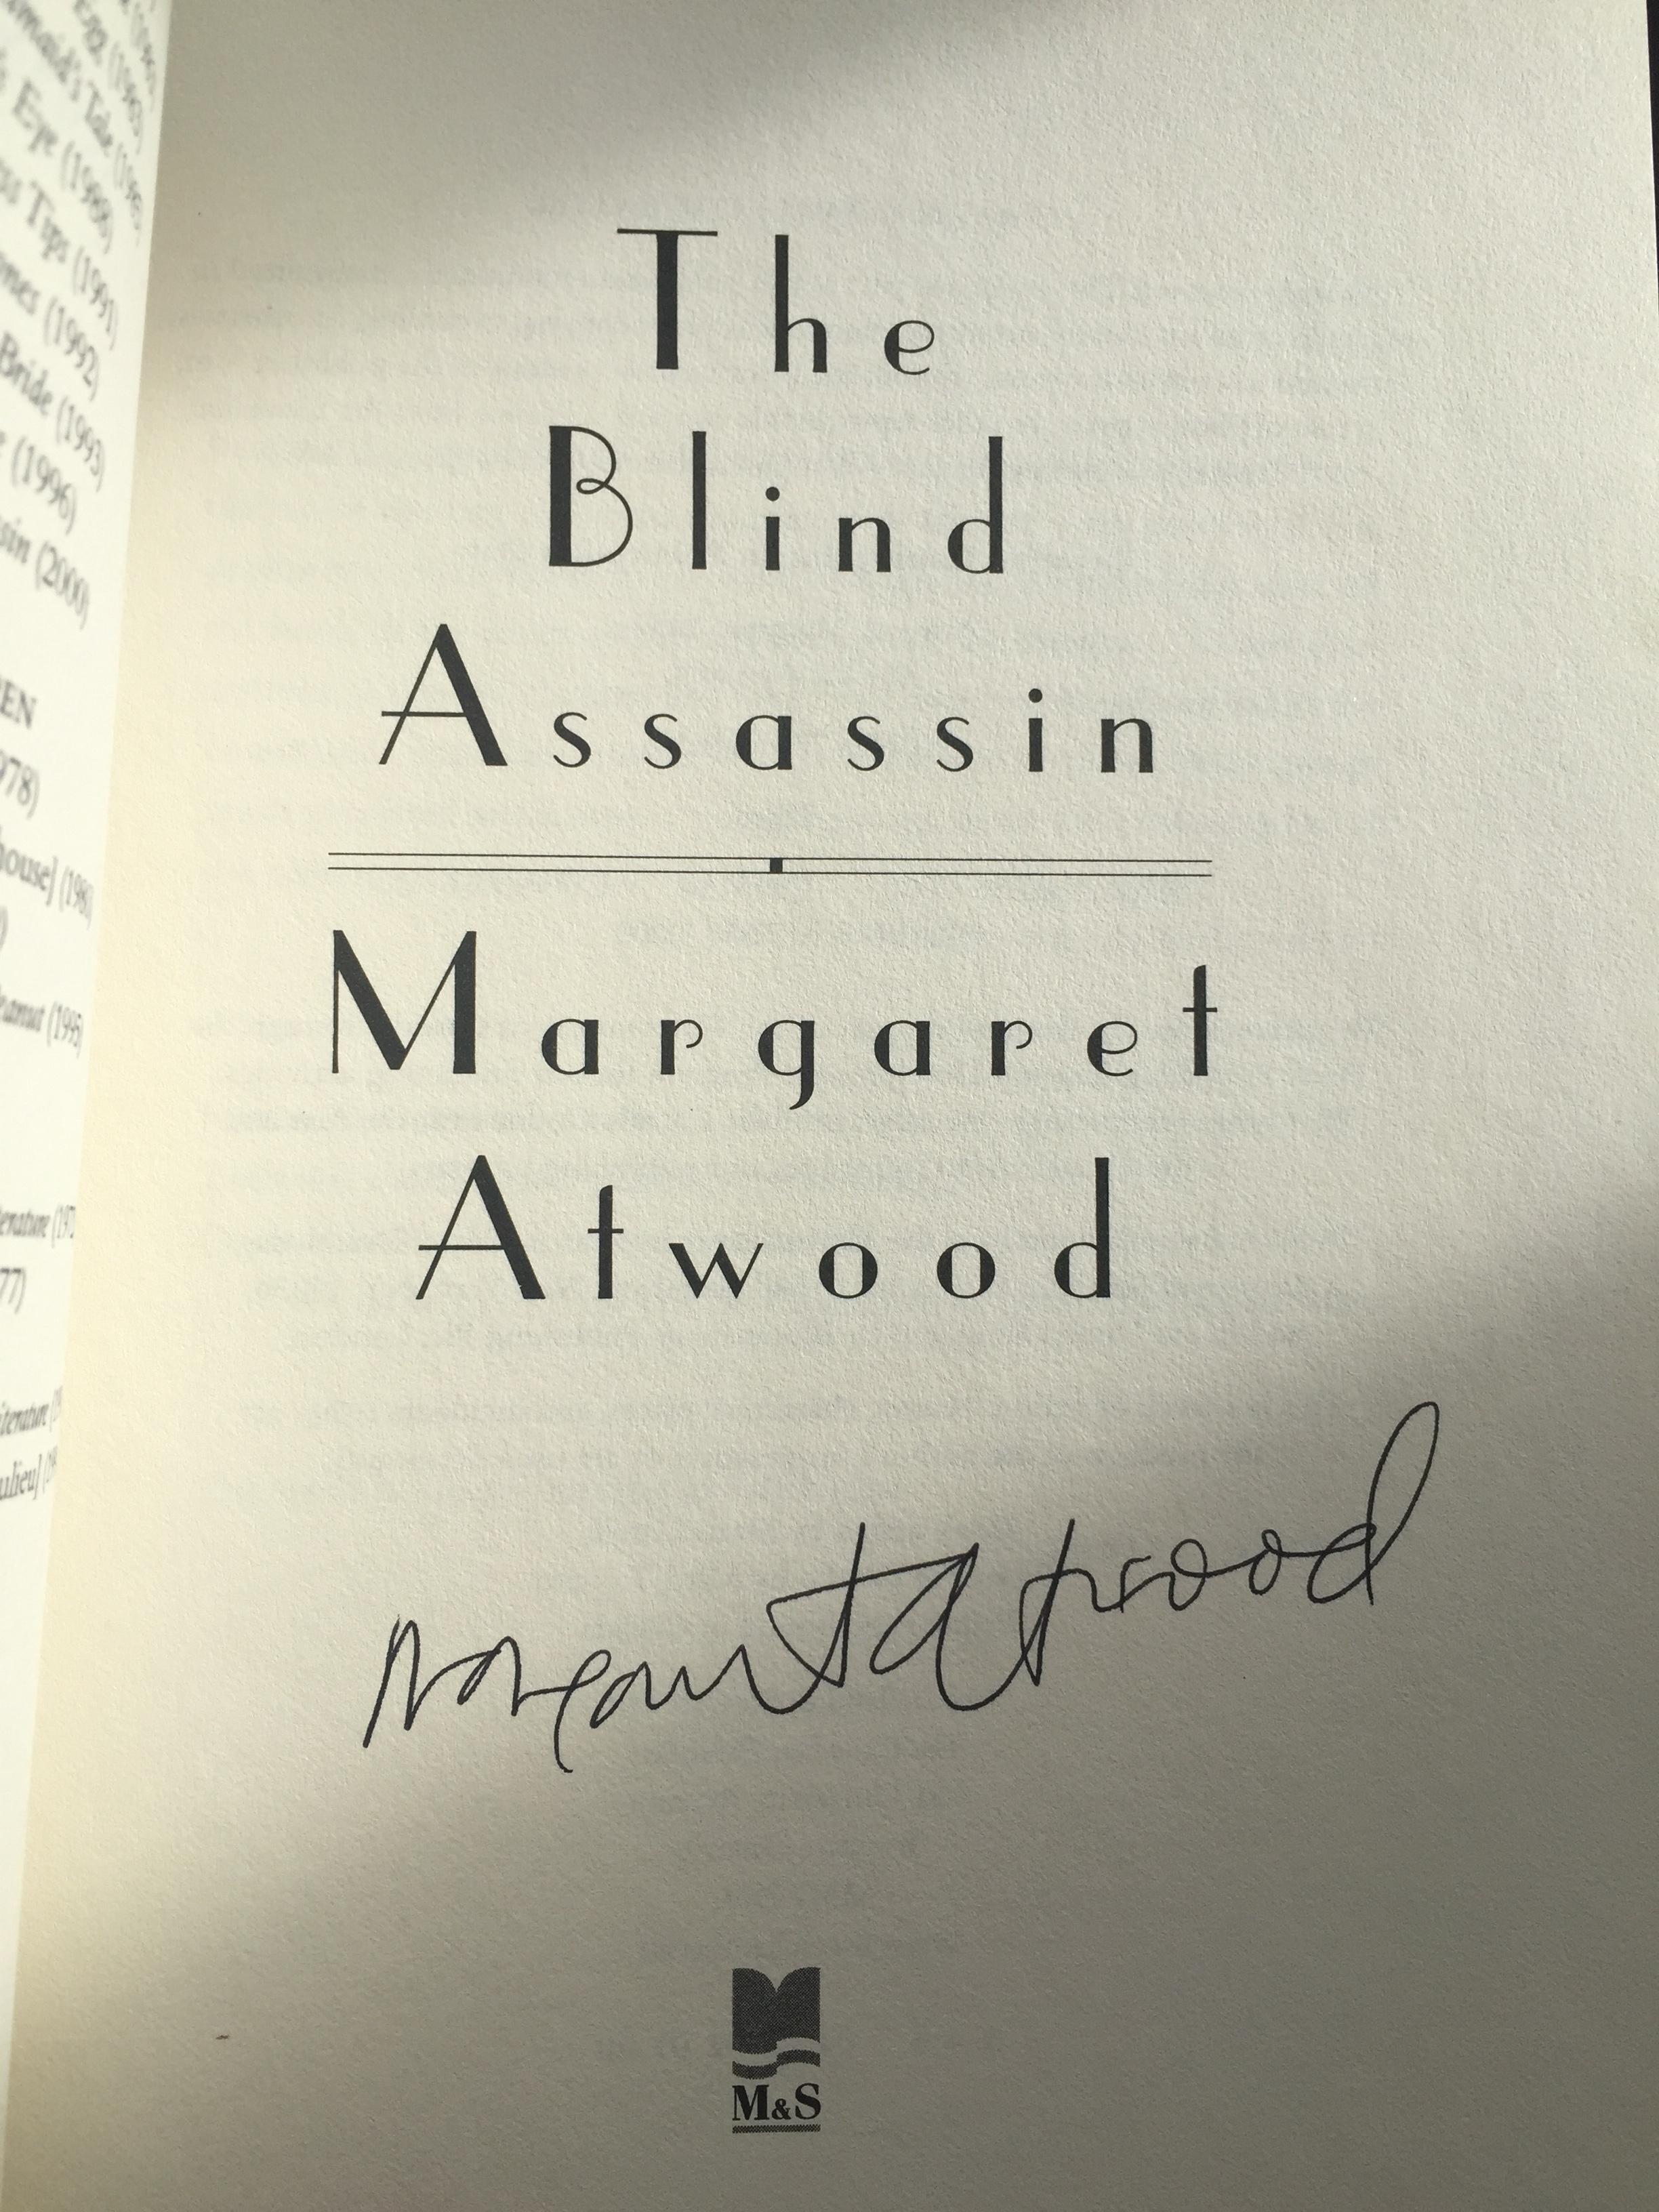 Off My Bookshelf, blog post by Aspasia S. Bissas